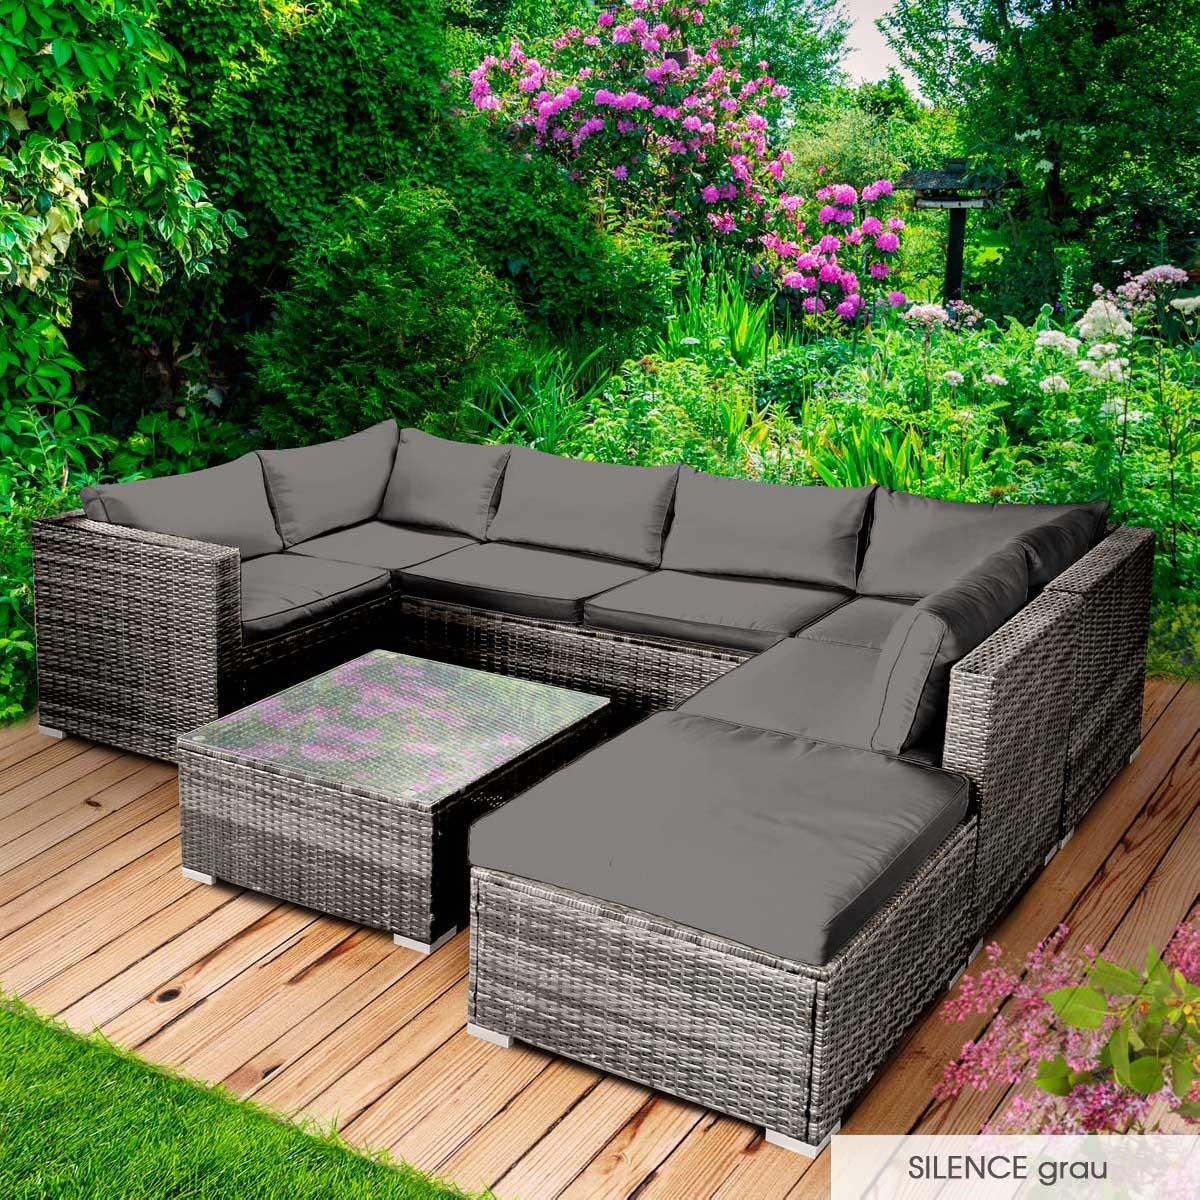 Gartenmoebel-Poly-Rattan-Lounge-Moebel-Sitzgarnitur-Gartengarnitur-Sitzgruppe-Sofa Indexbild 33